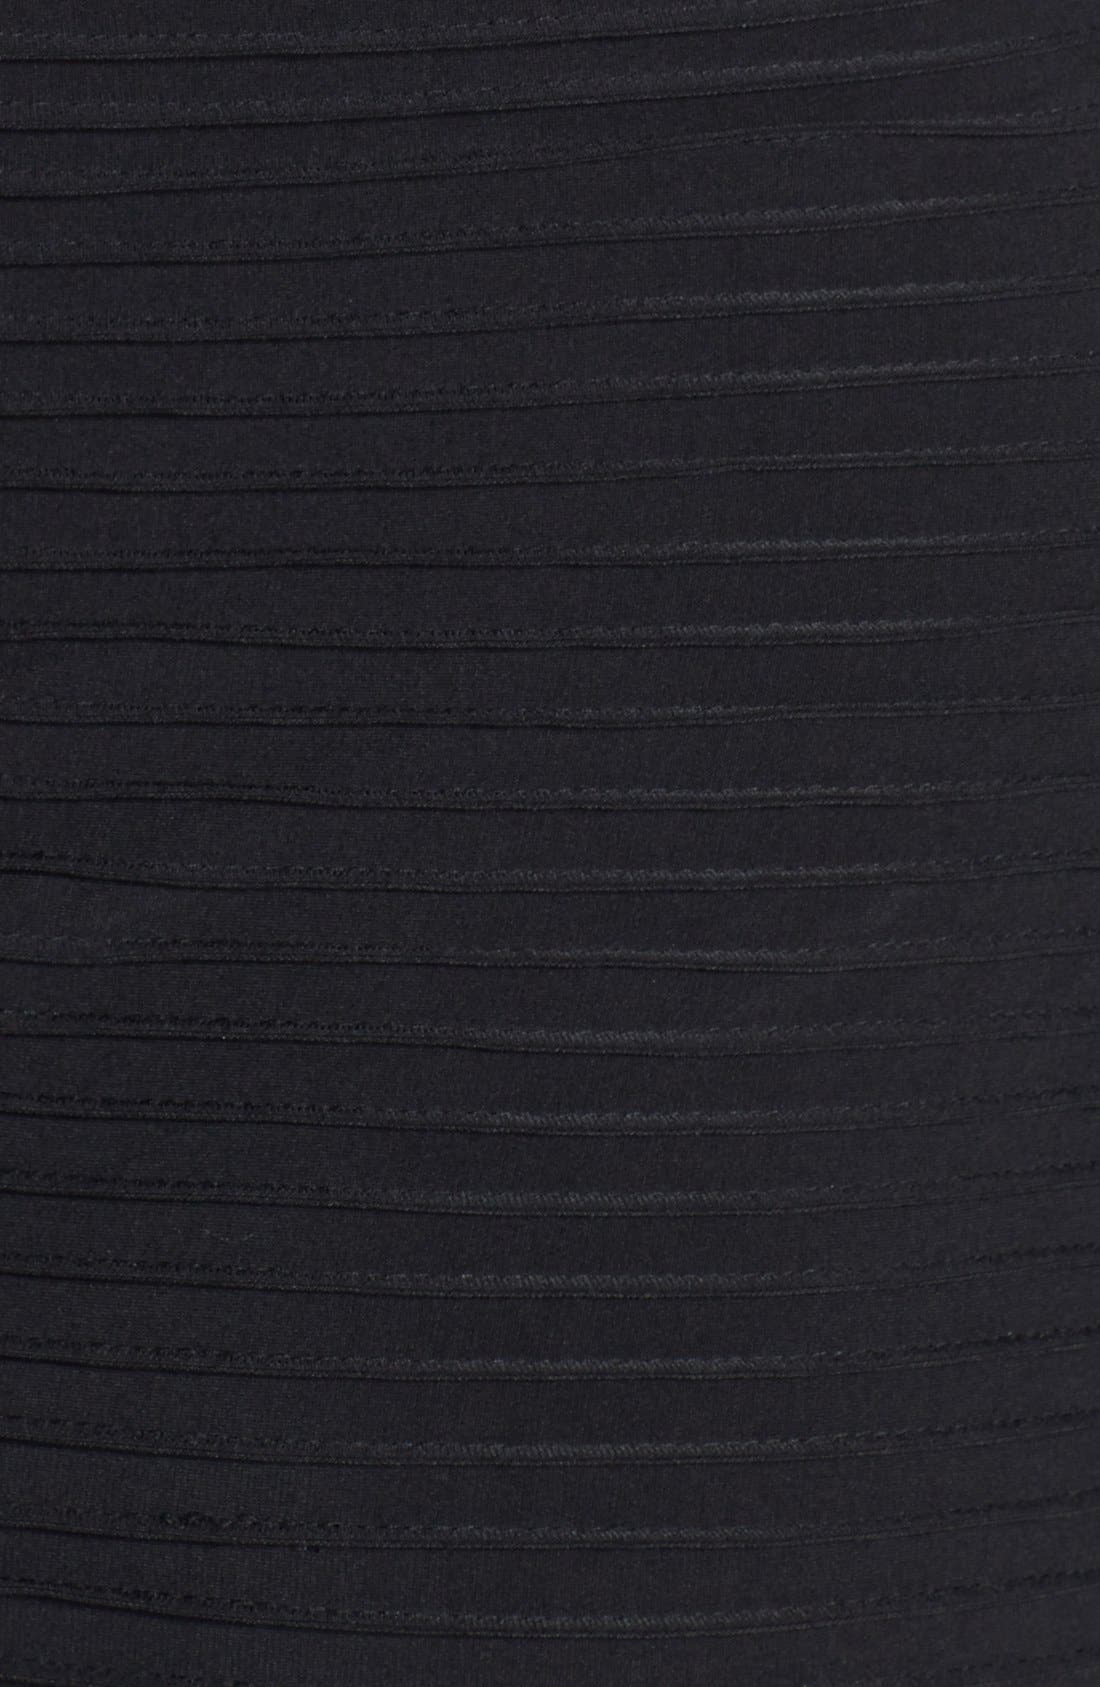 Alternate Image 3  - Calvin Klein Illusion Yoke & Sleeve Matte Jersey Sheath Dress (Plus Size)